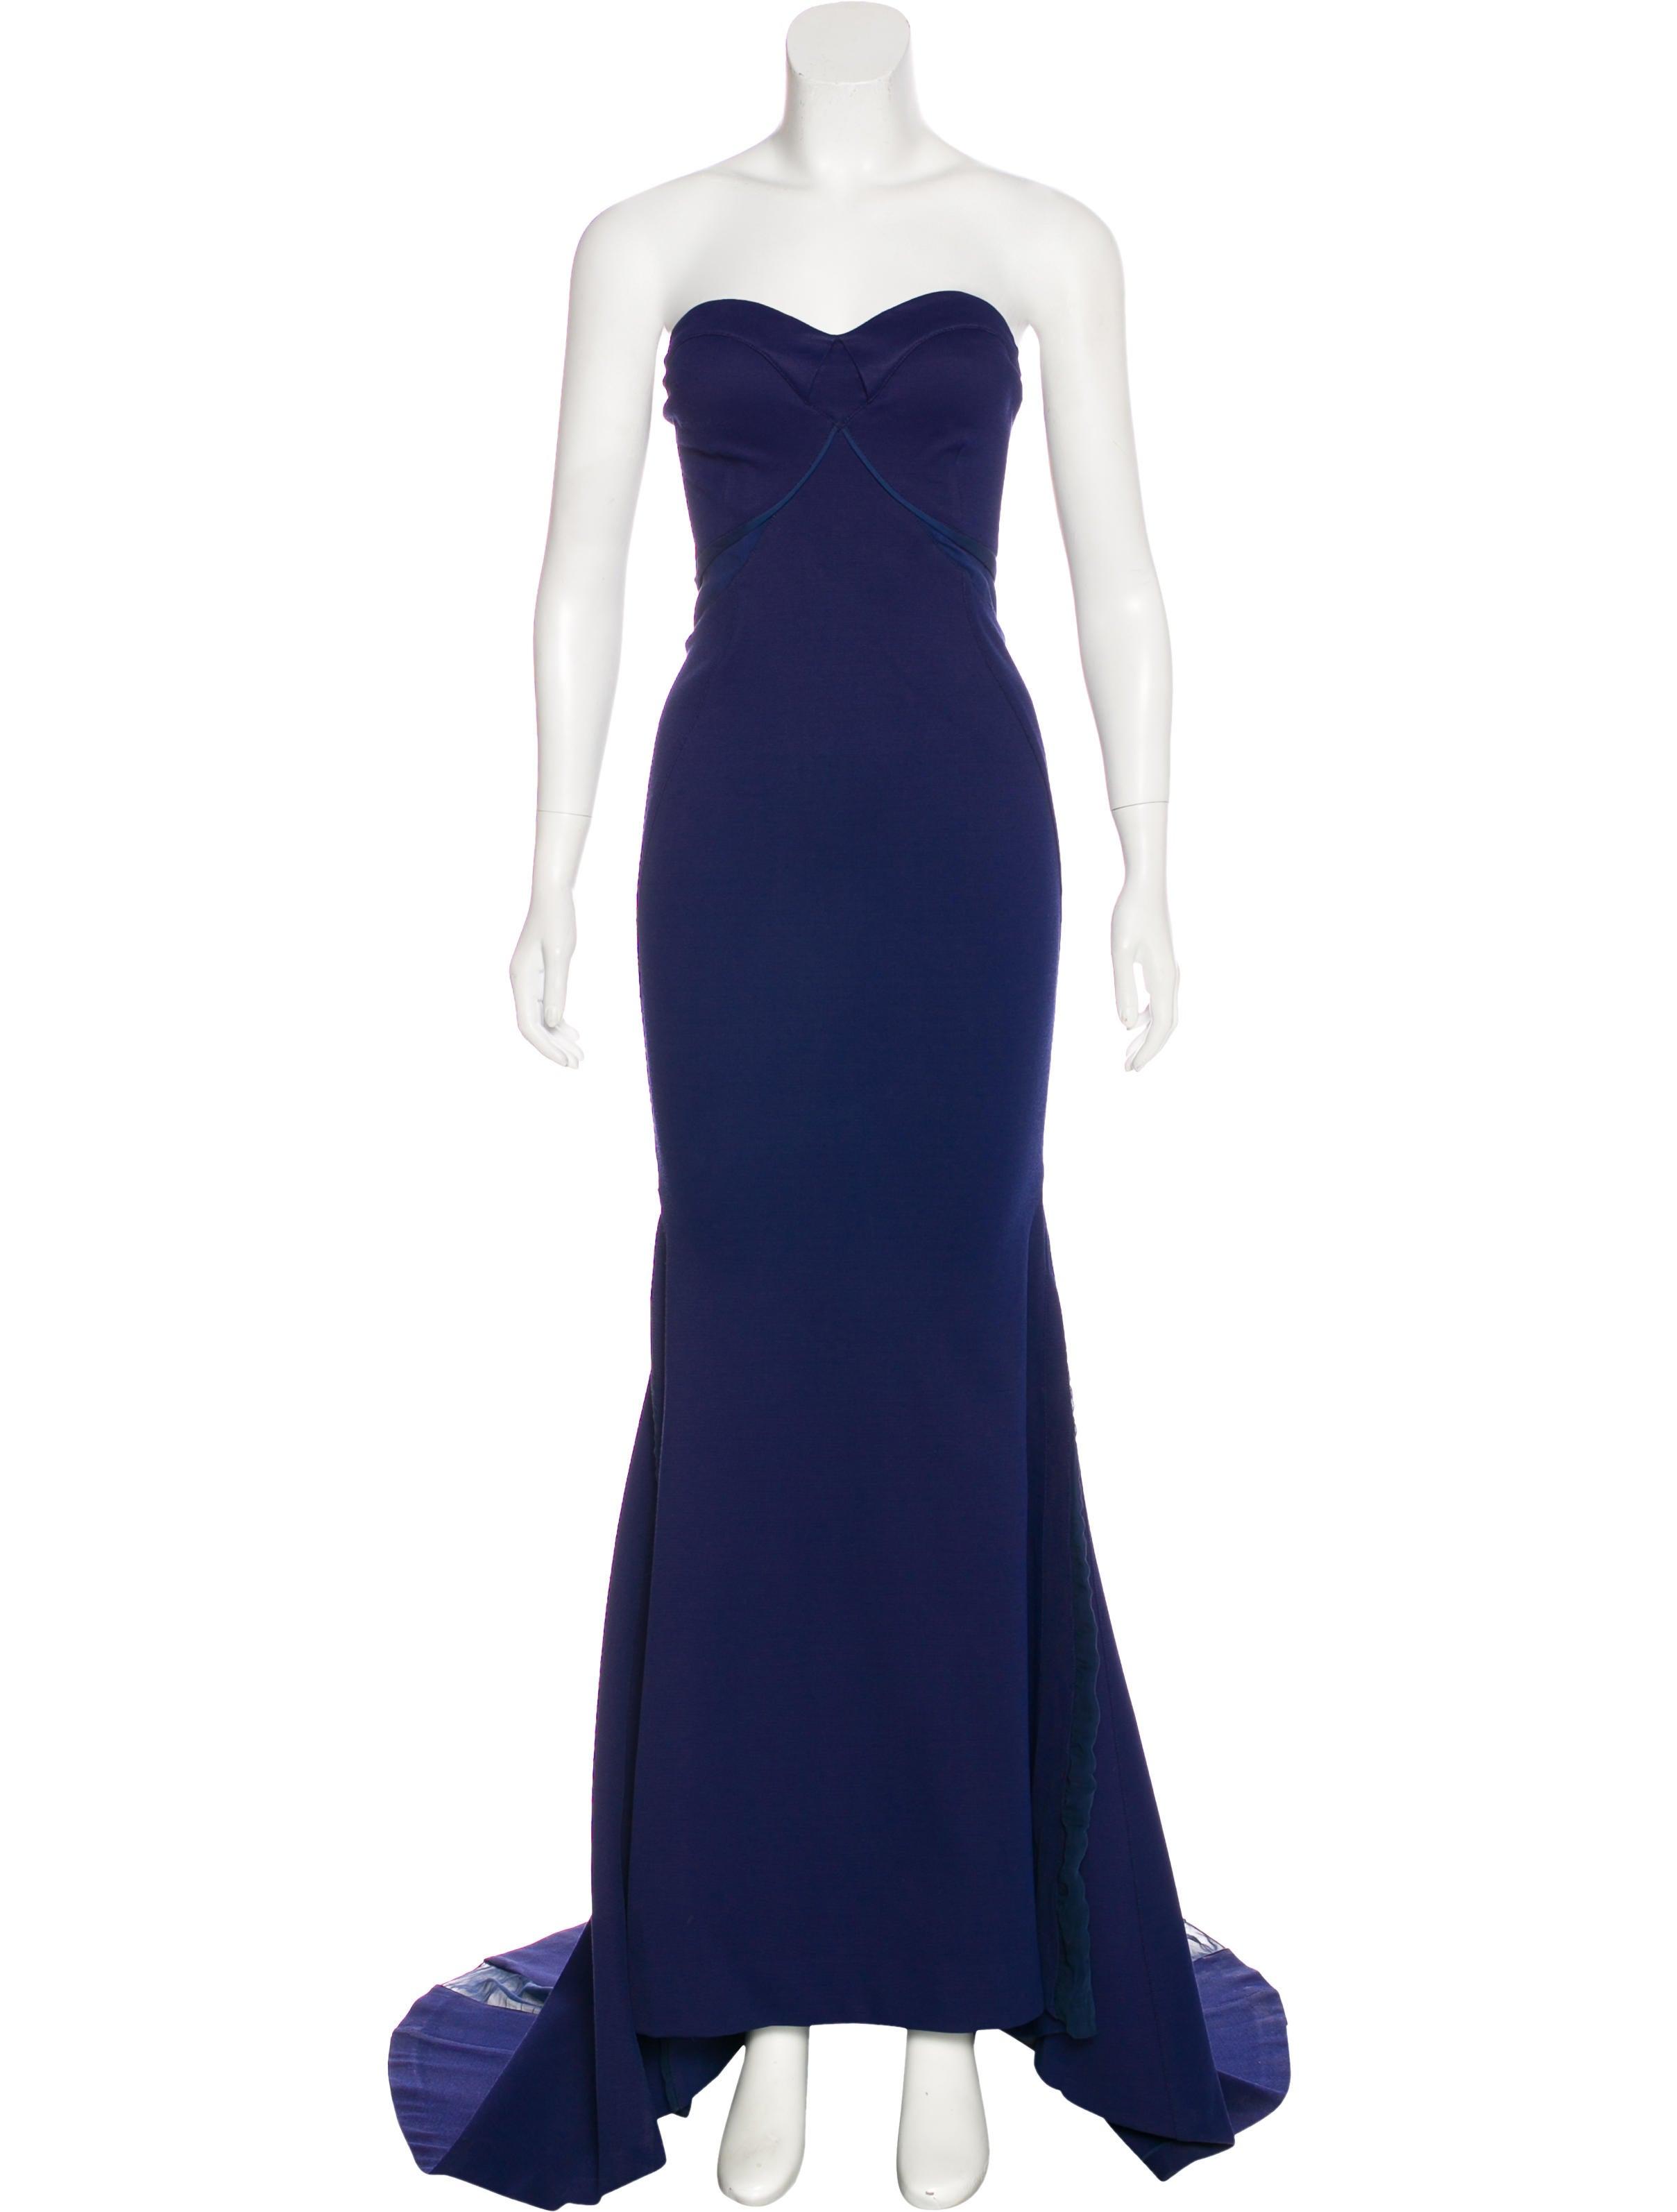 Zac Posen Sheer-Trimmed Evening Gown - Clothing - ZAC25741   The ...